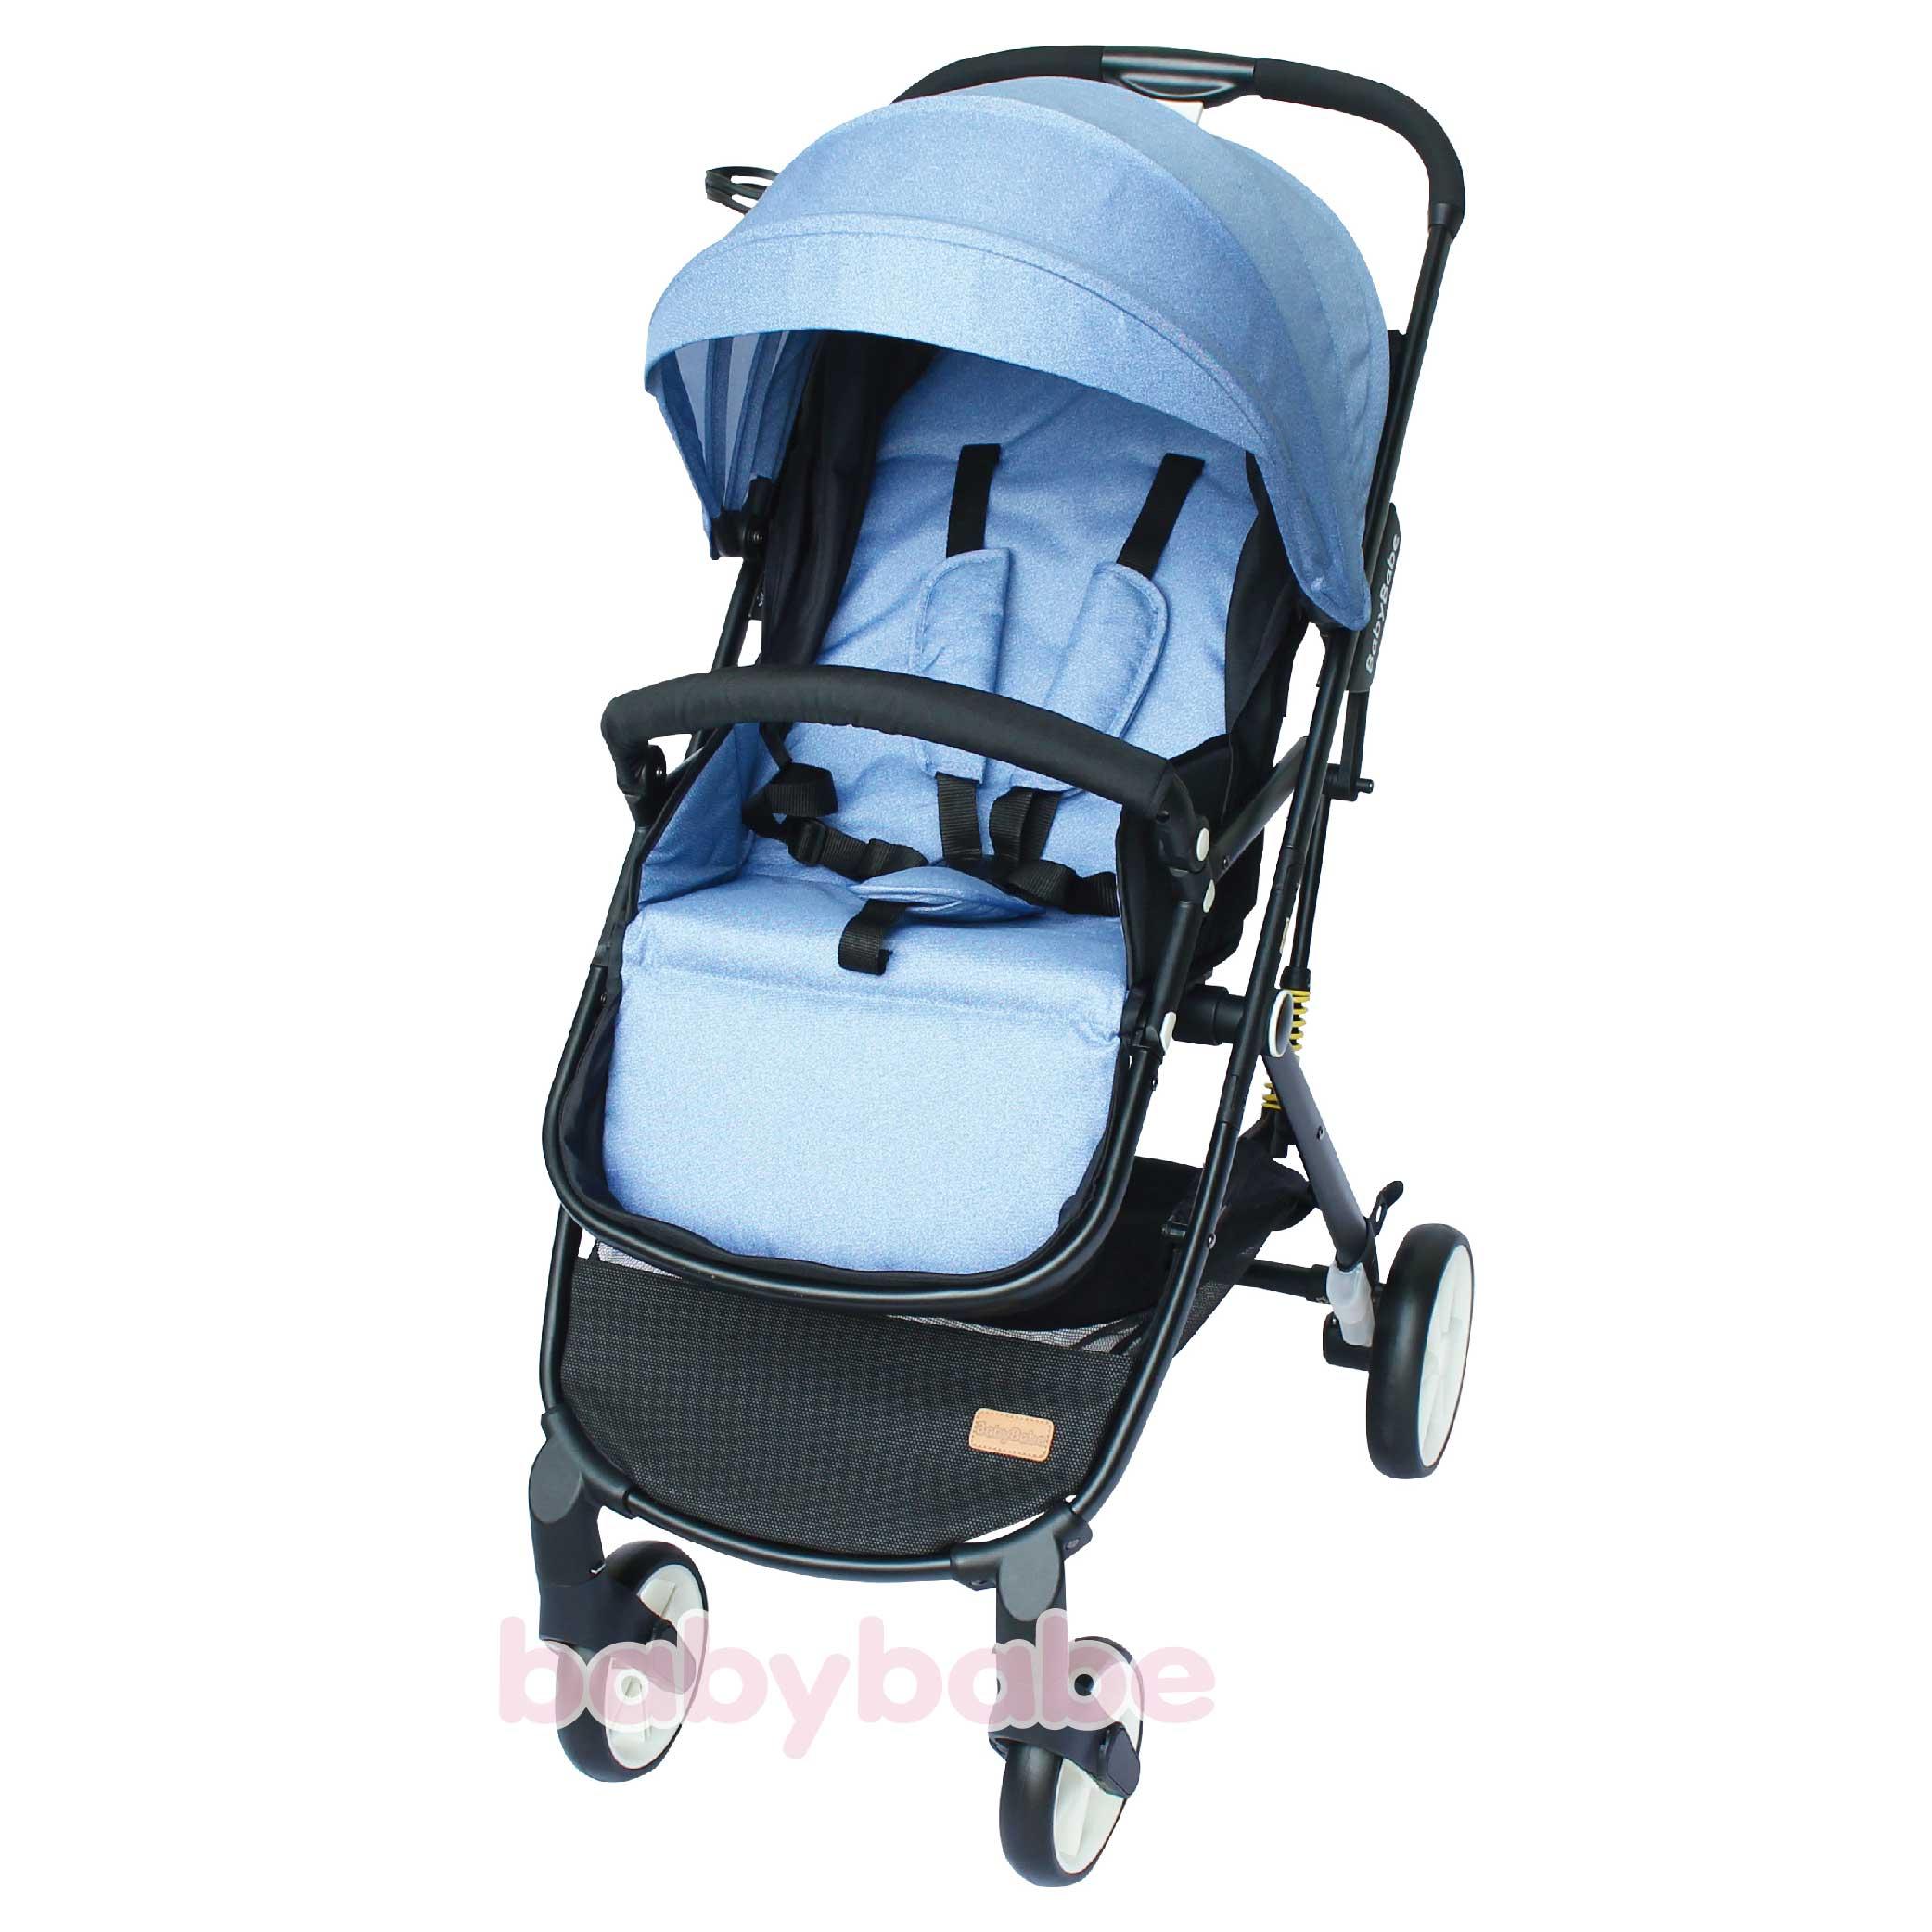 S366嬰幼兒時尚旅行推車-牛仔藍-01